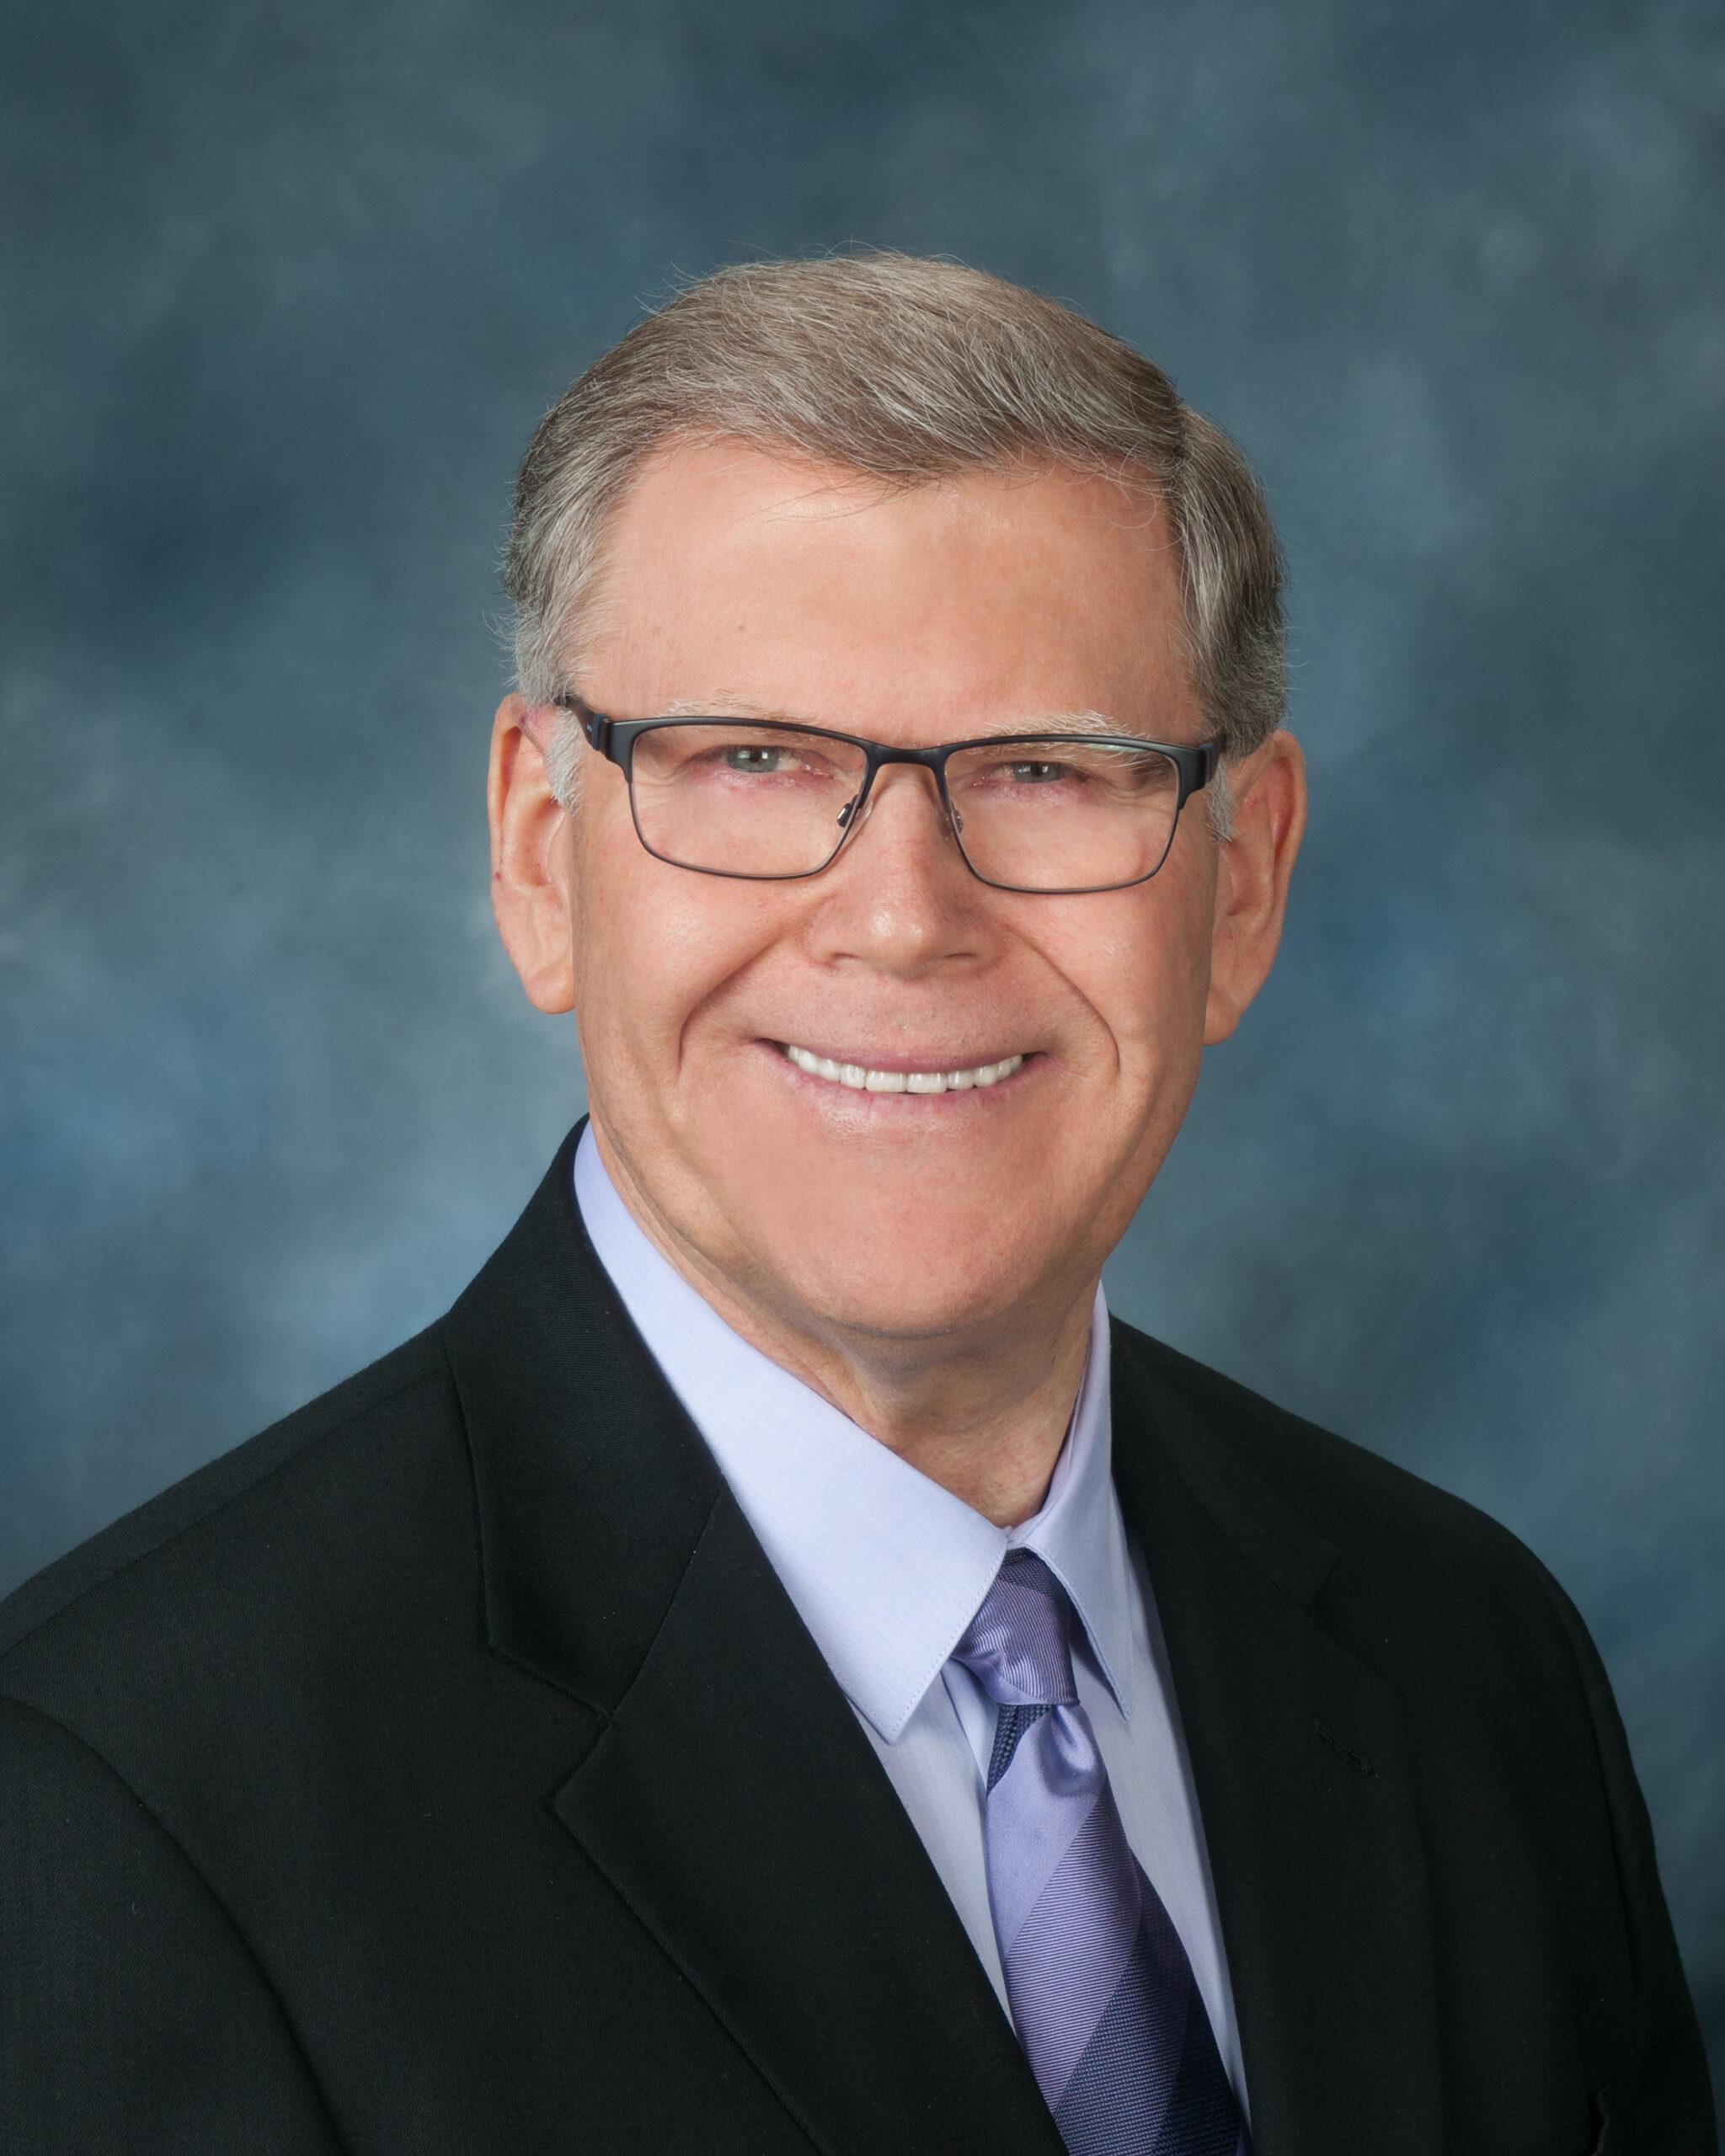 Profile image of Kenneth Hellevang, PhD, PE